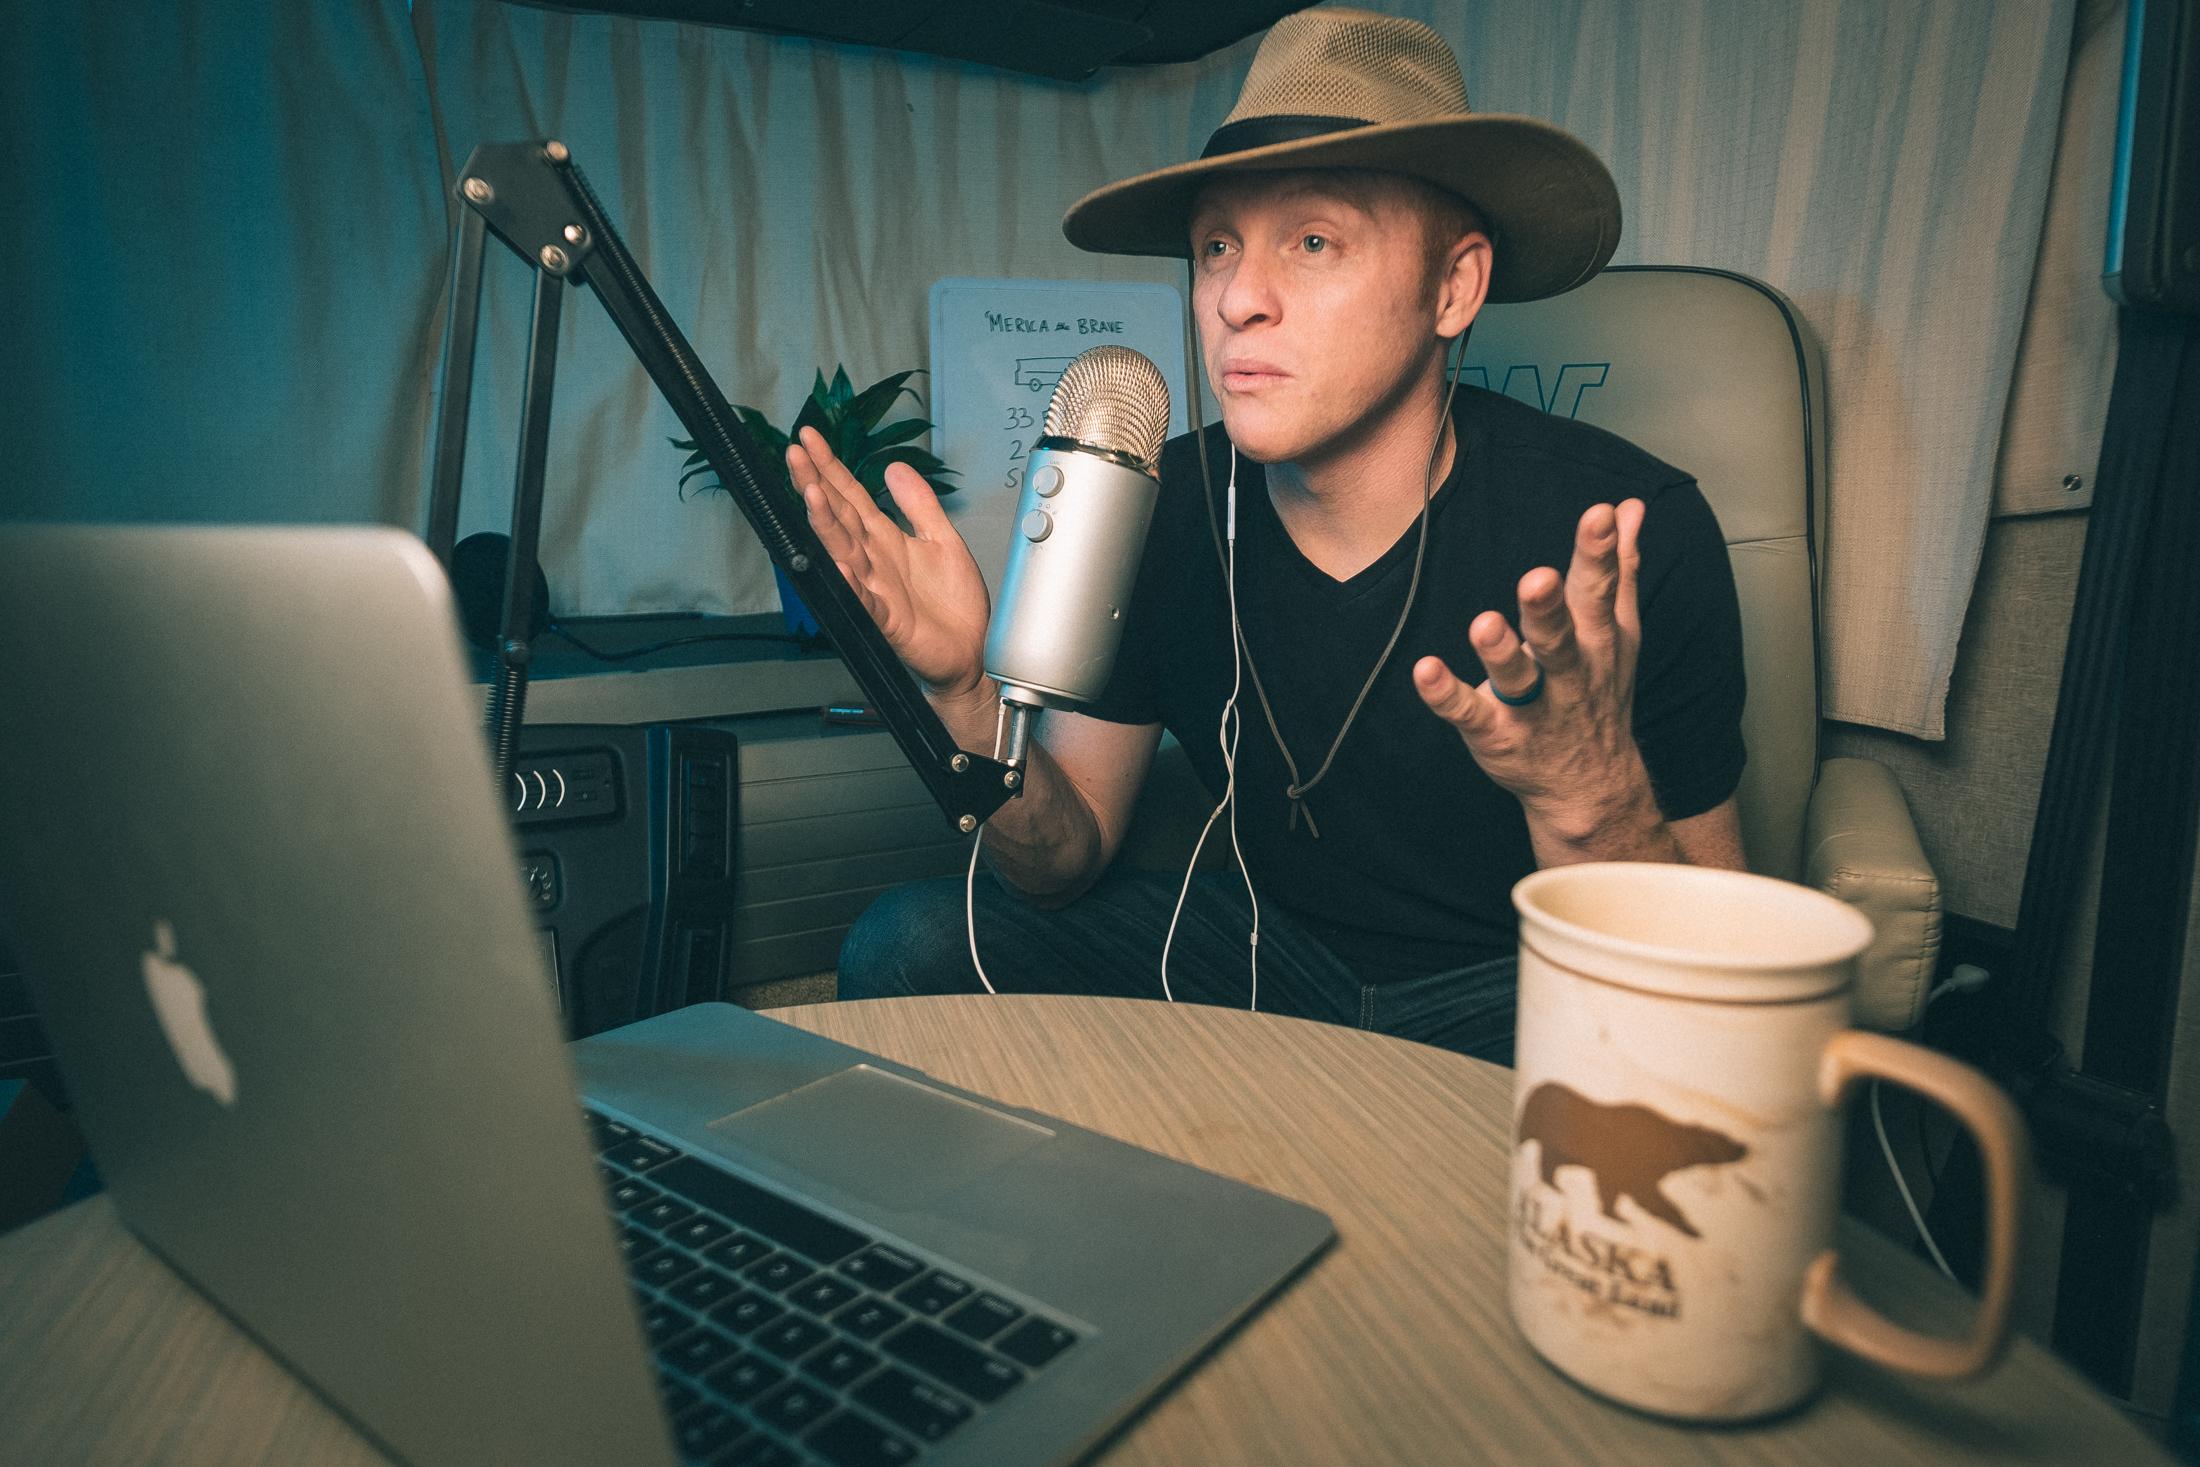 Heath recording his podcast. Image: Kyle Kesterson